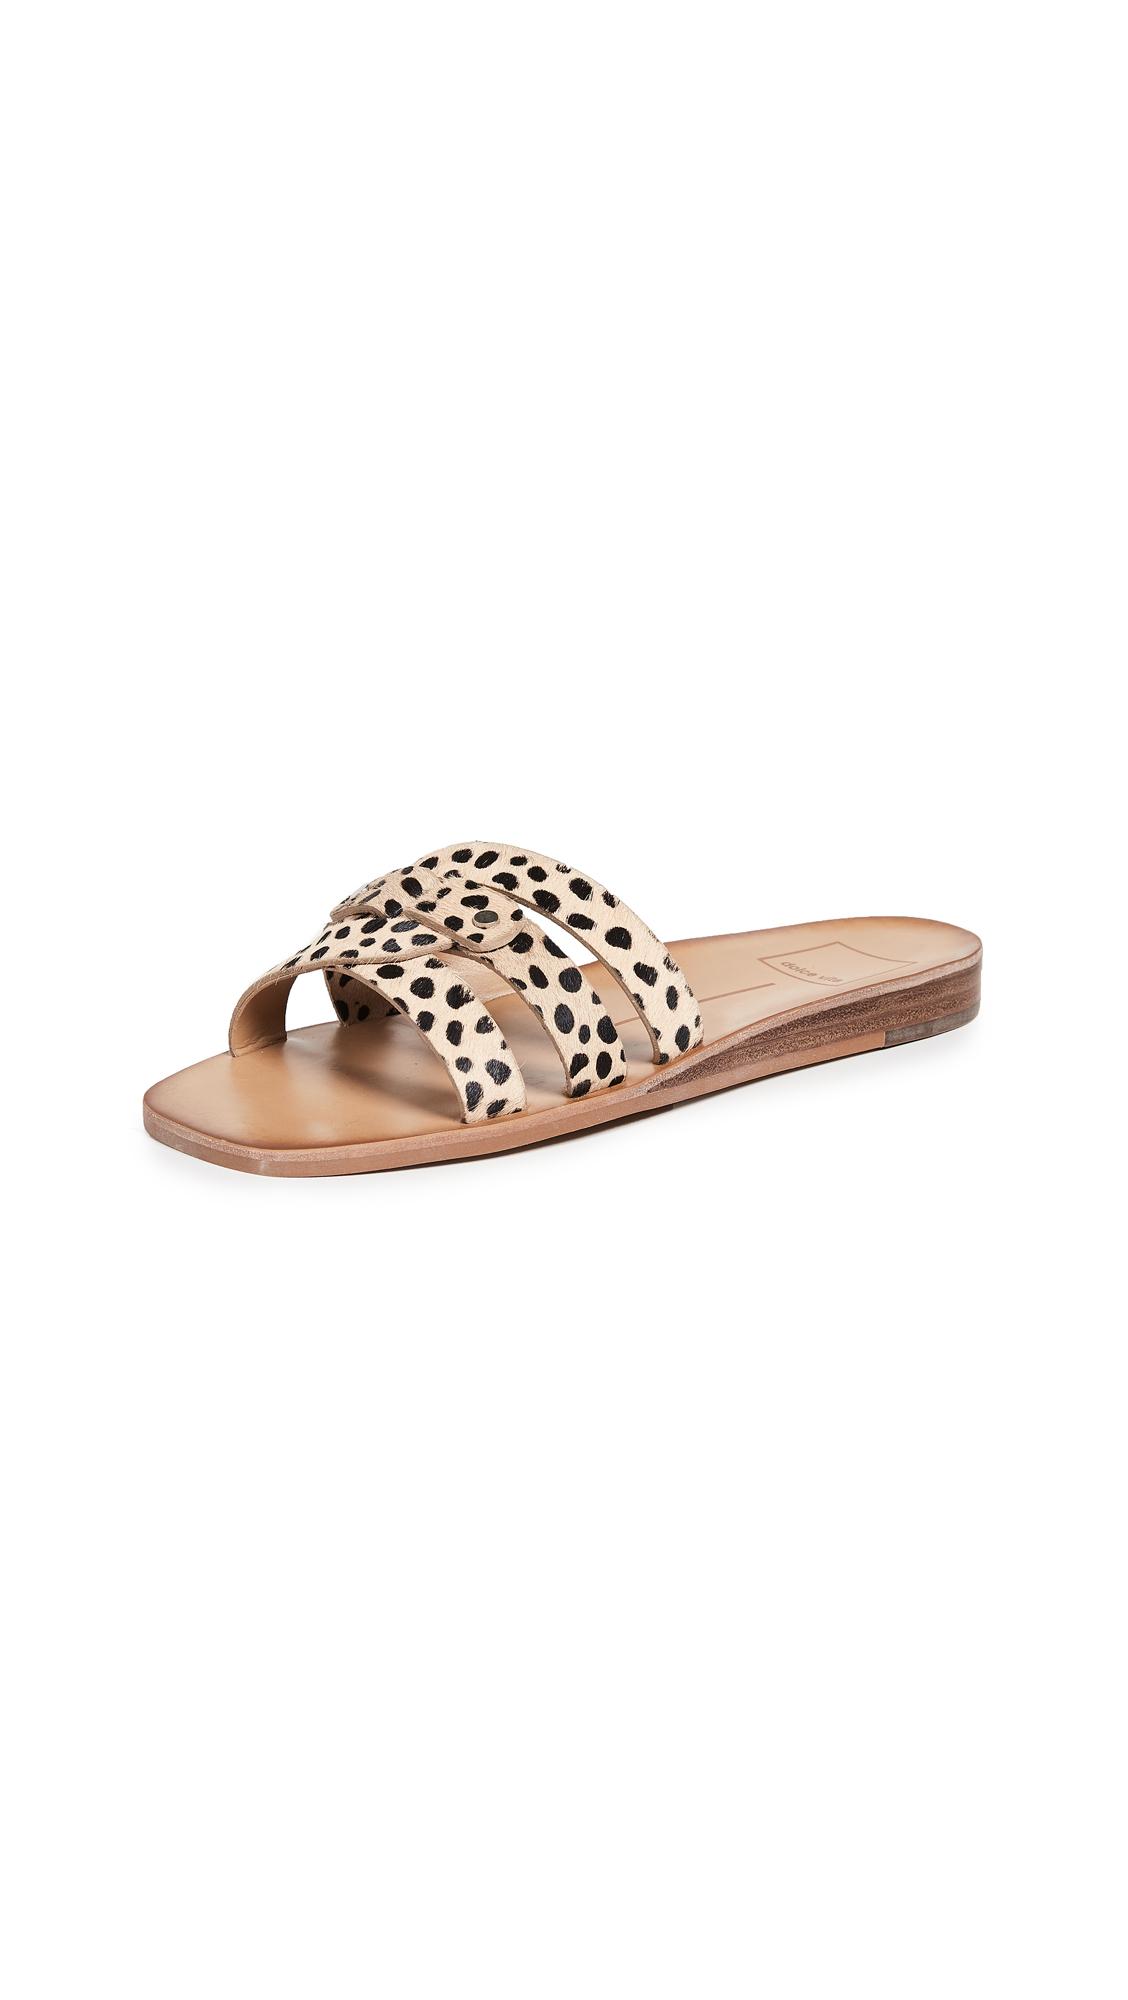 Dolce Vita Cait Slides - Leopard